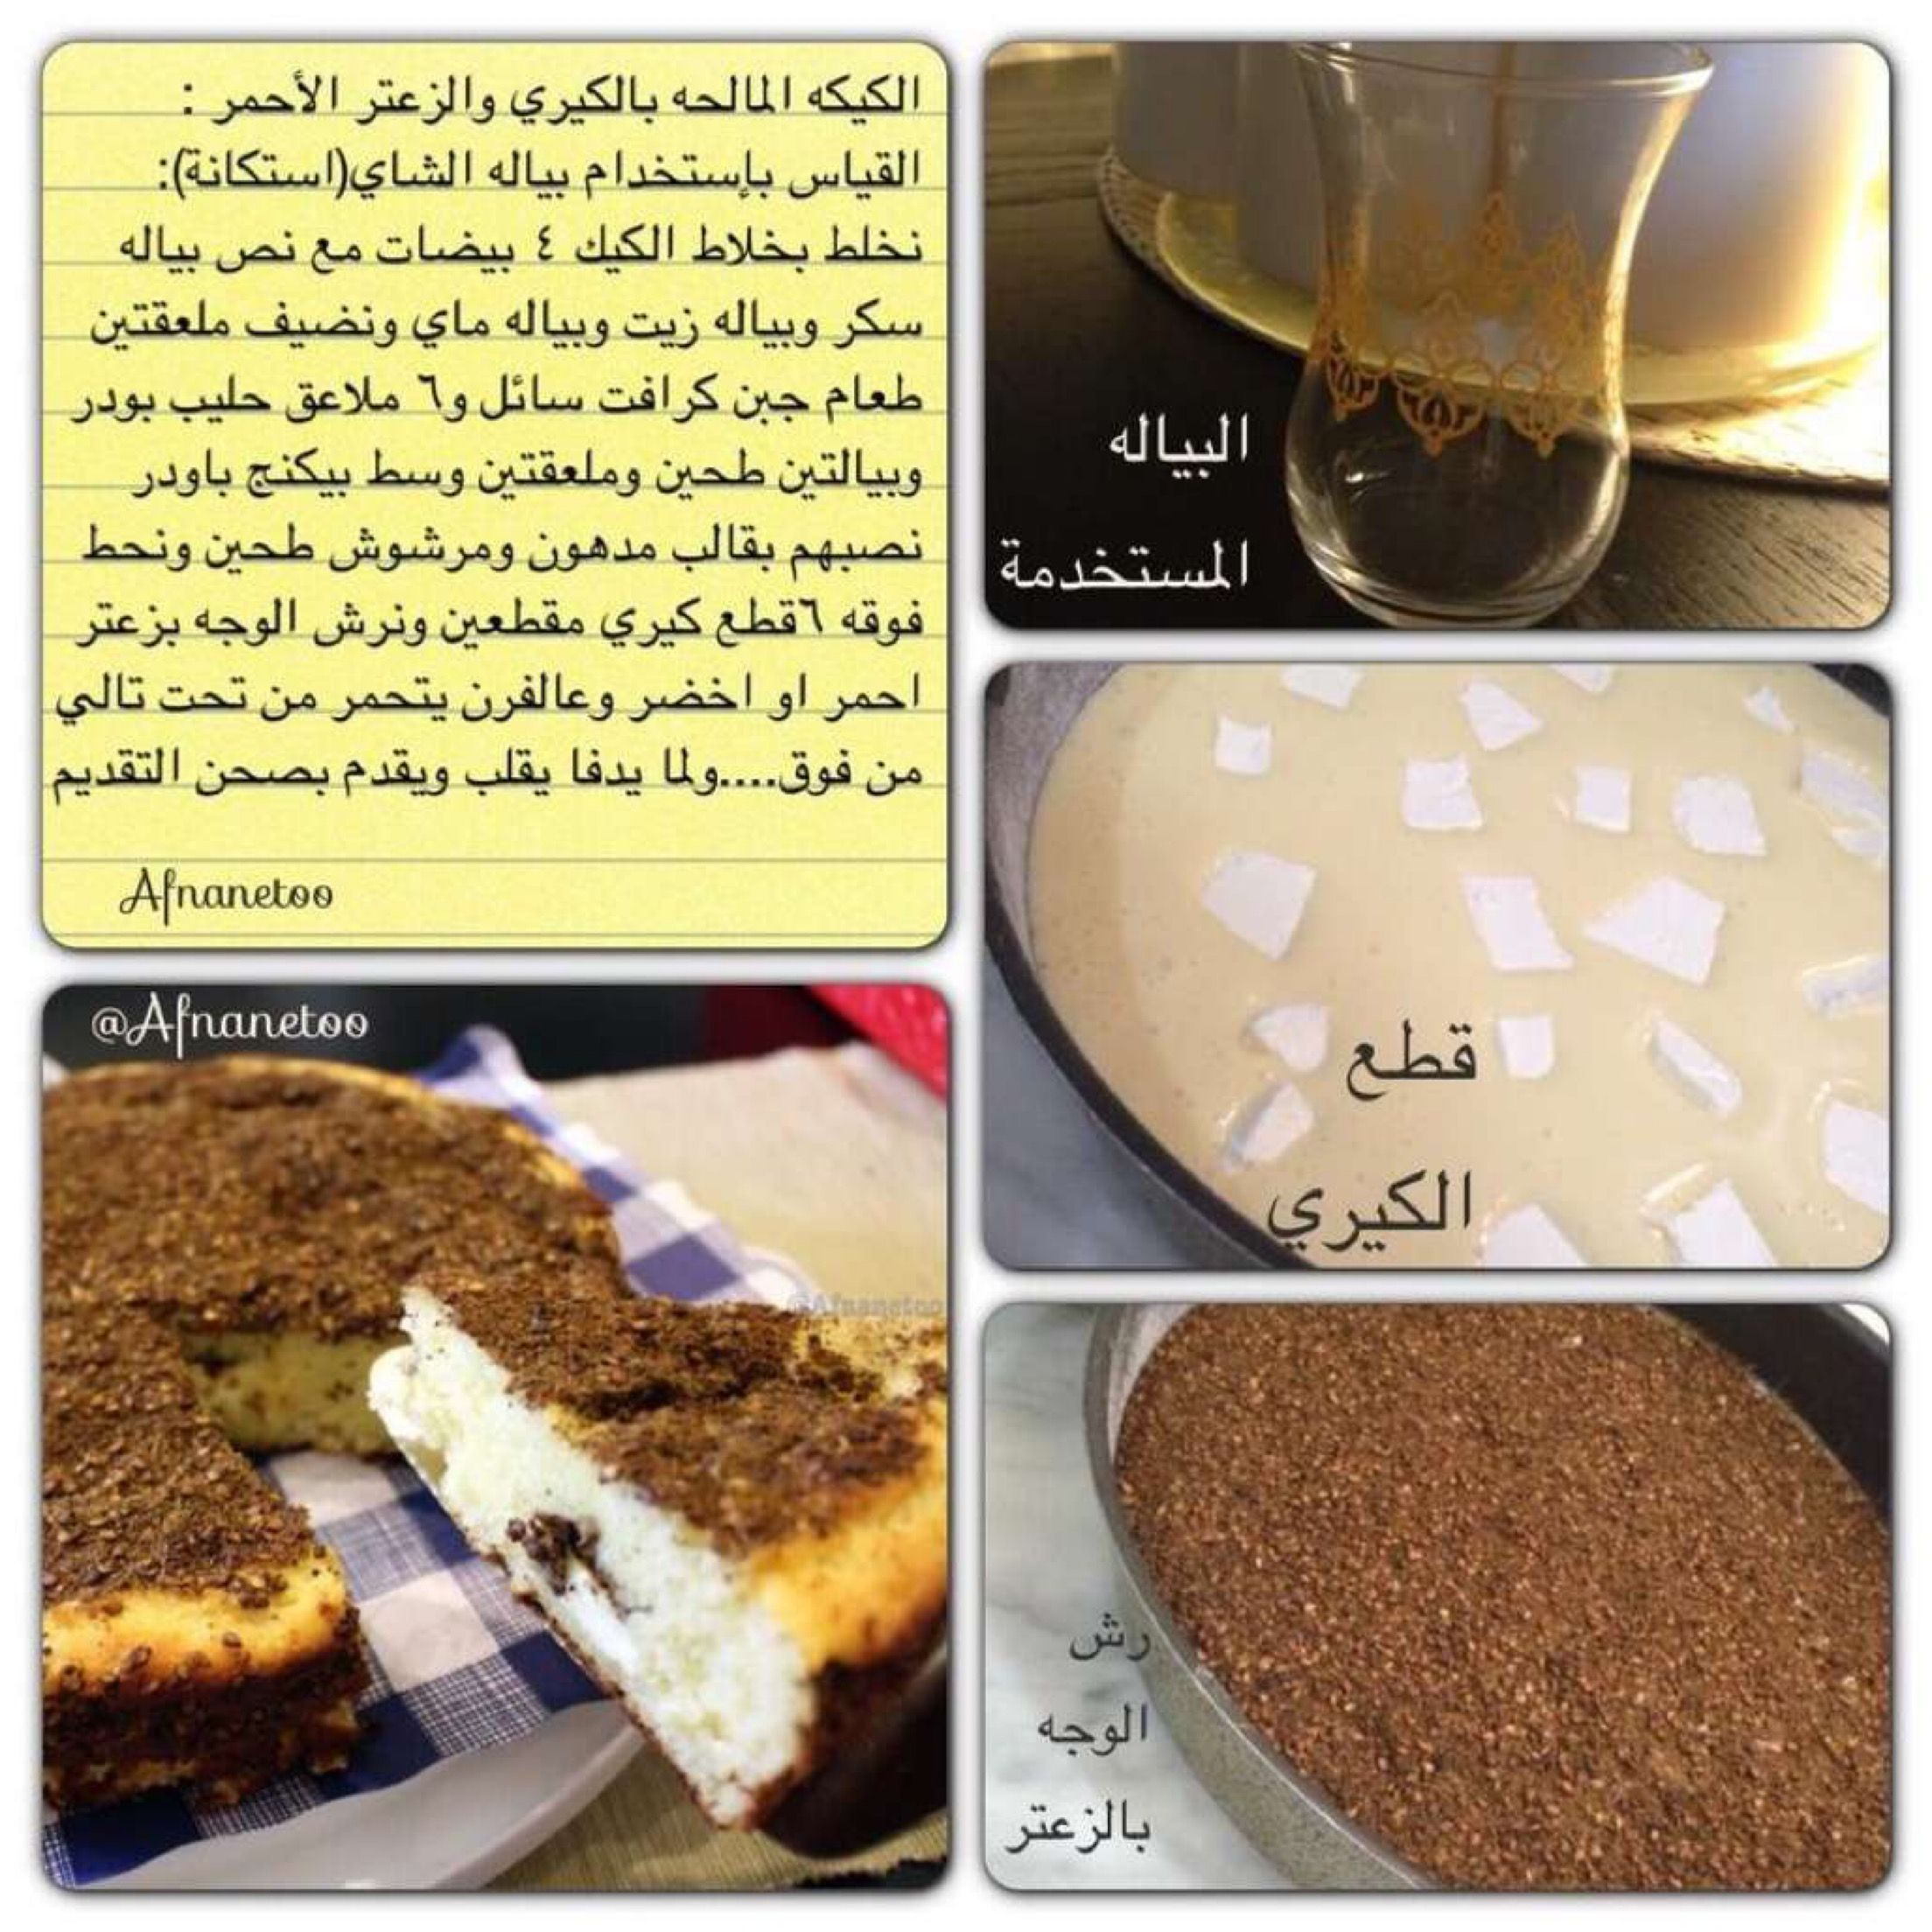 Pin By Mahra On Food In 2020 Yummy Food Dessert Ramadan Recipes Yummy Food